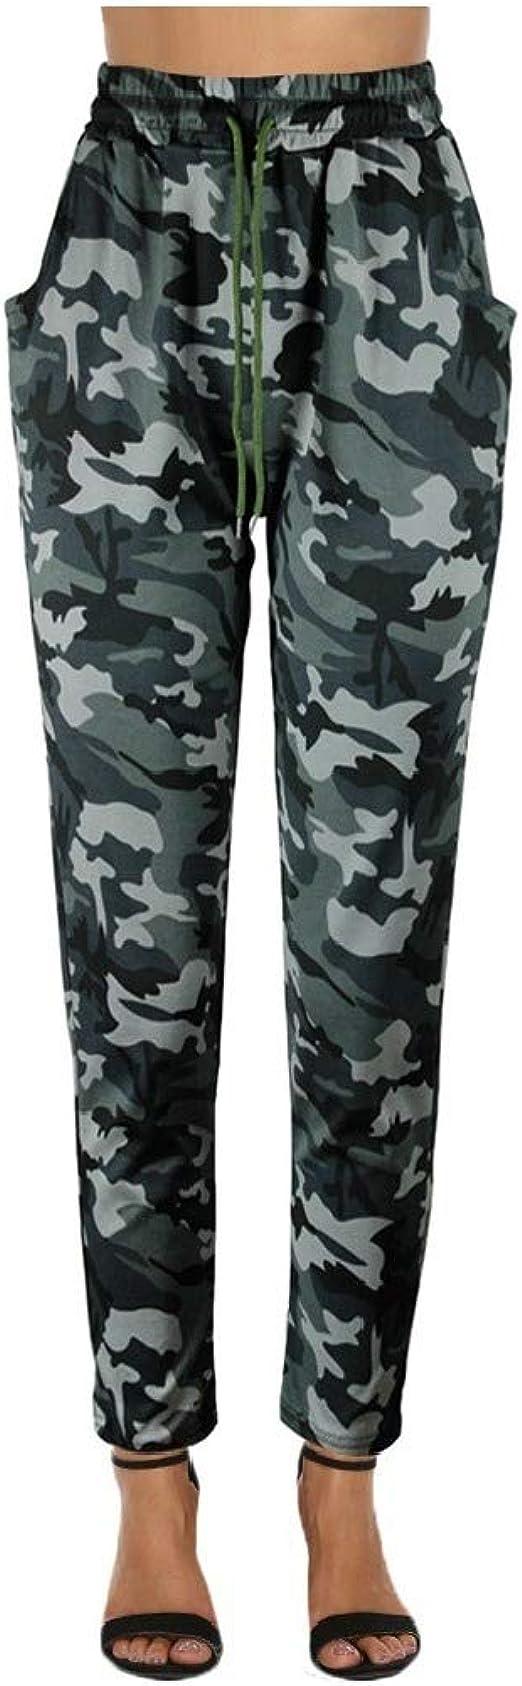 VITryst Women Patterned Slim Elastic Waist Harem Pocketed Camouflage Wear Pants